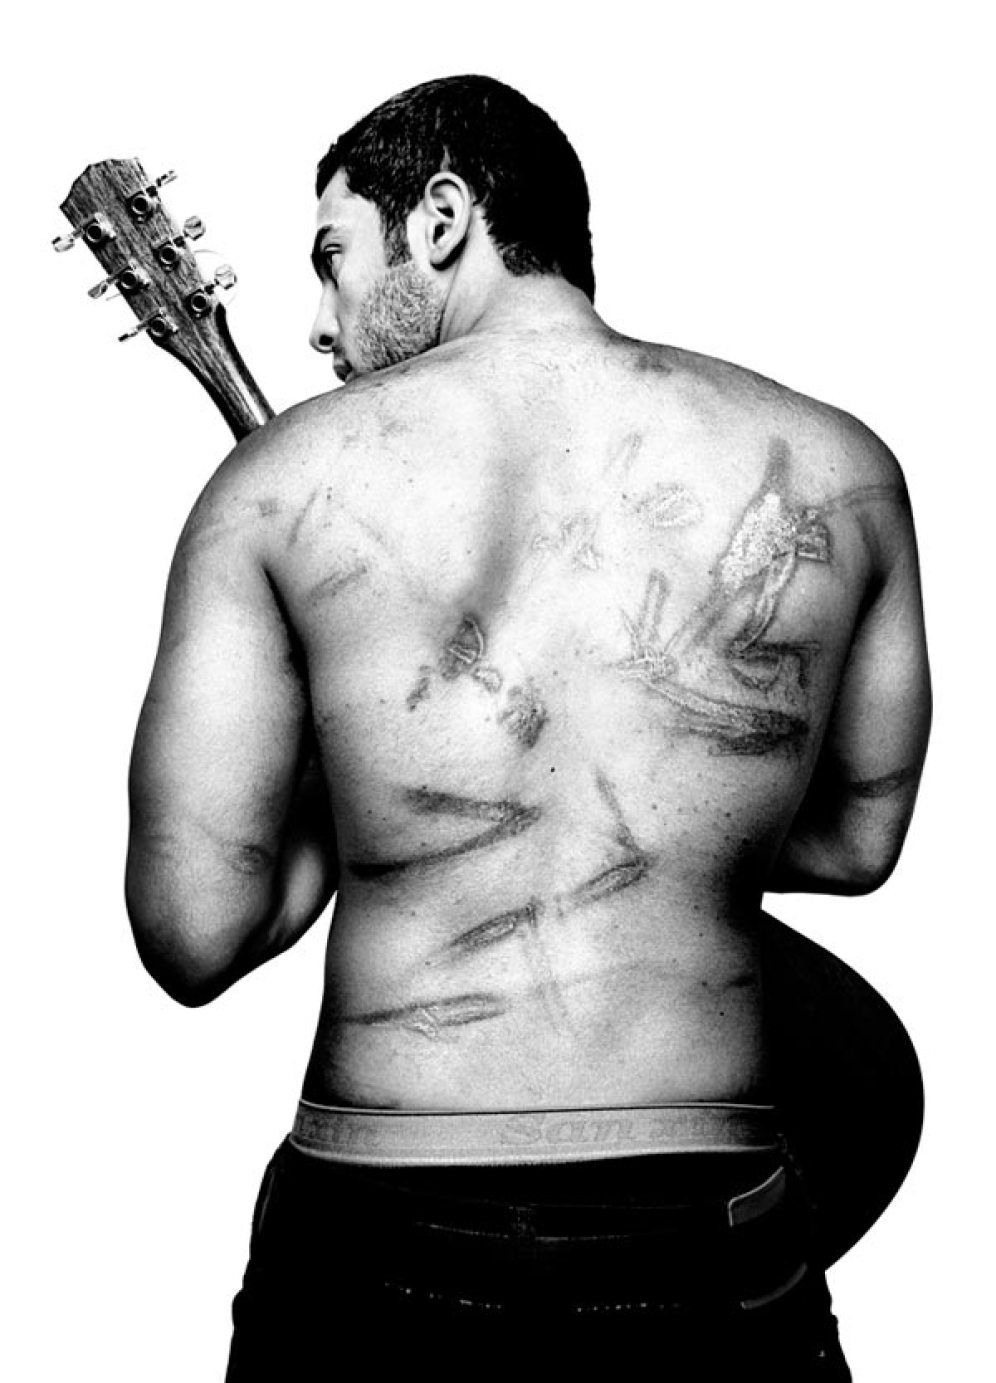 Ramy Essam, 23, singer, guitarist and songwriter